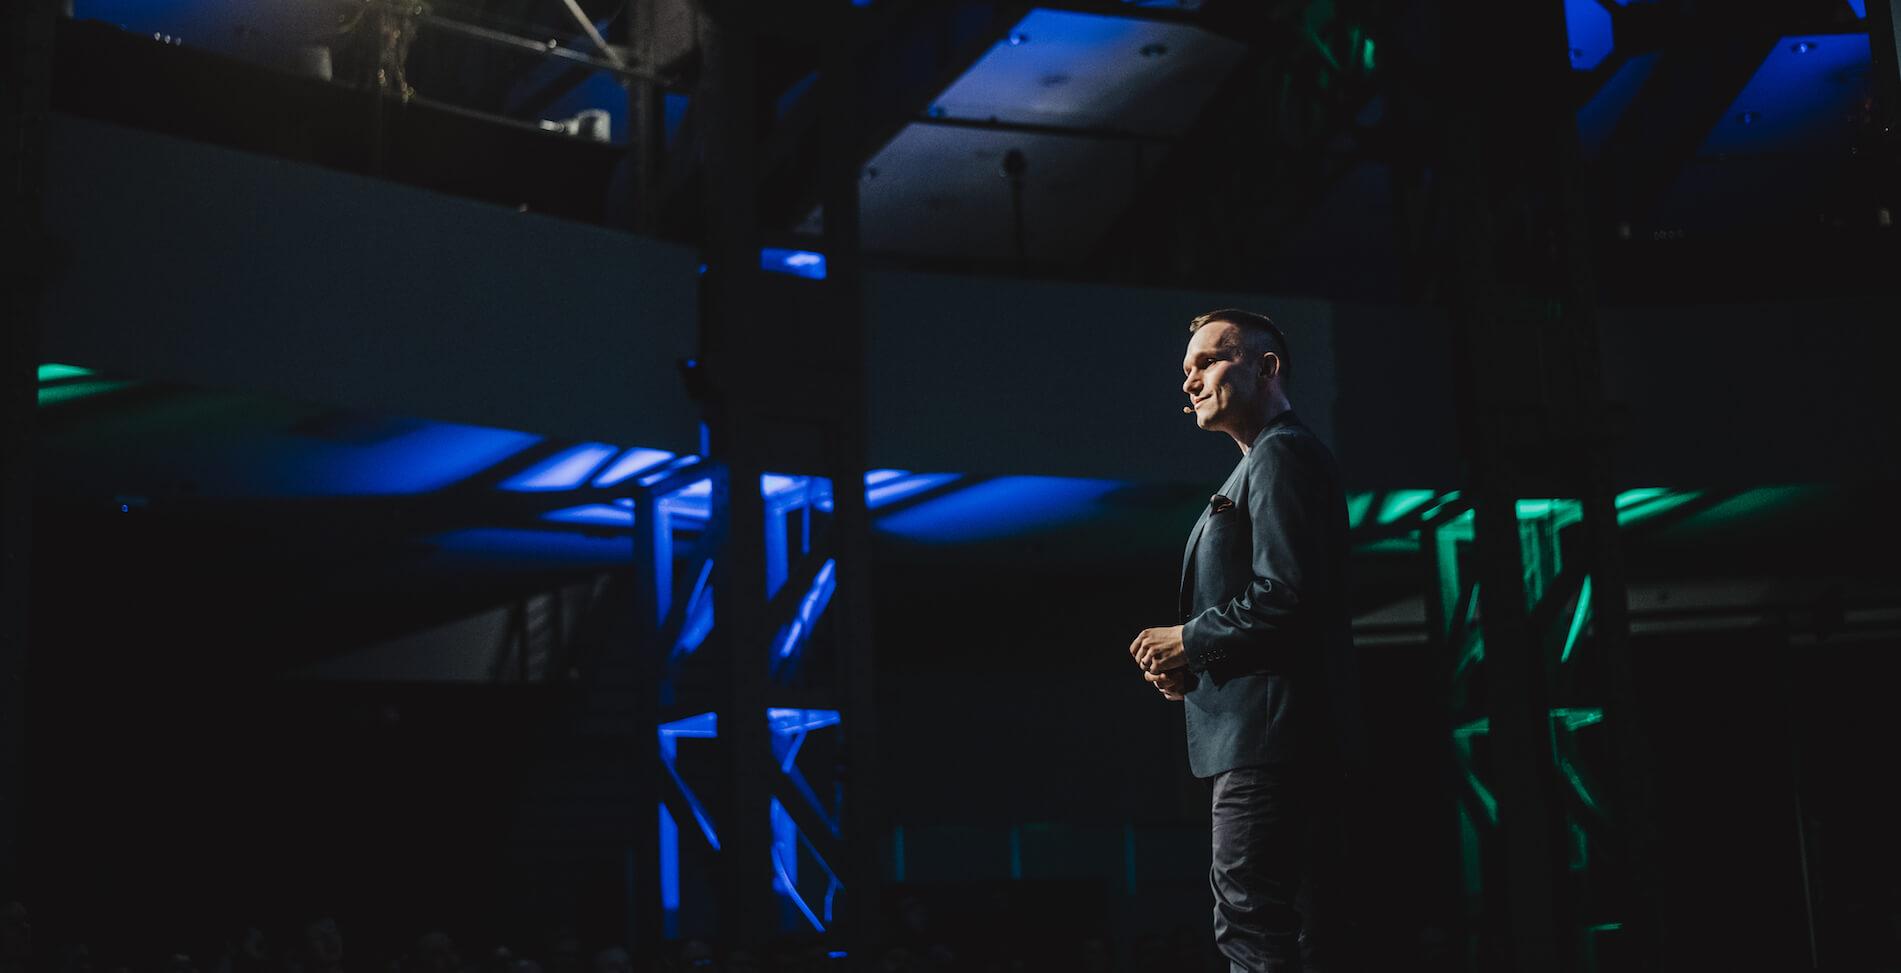 Netguru CEO at the stage